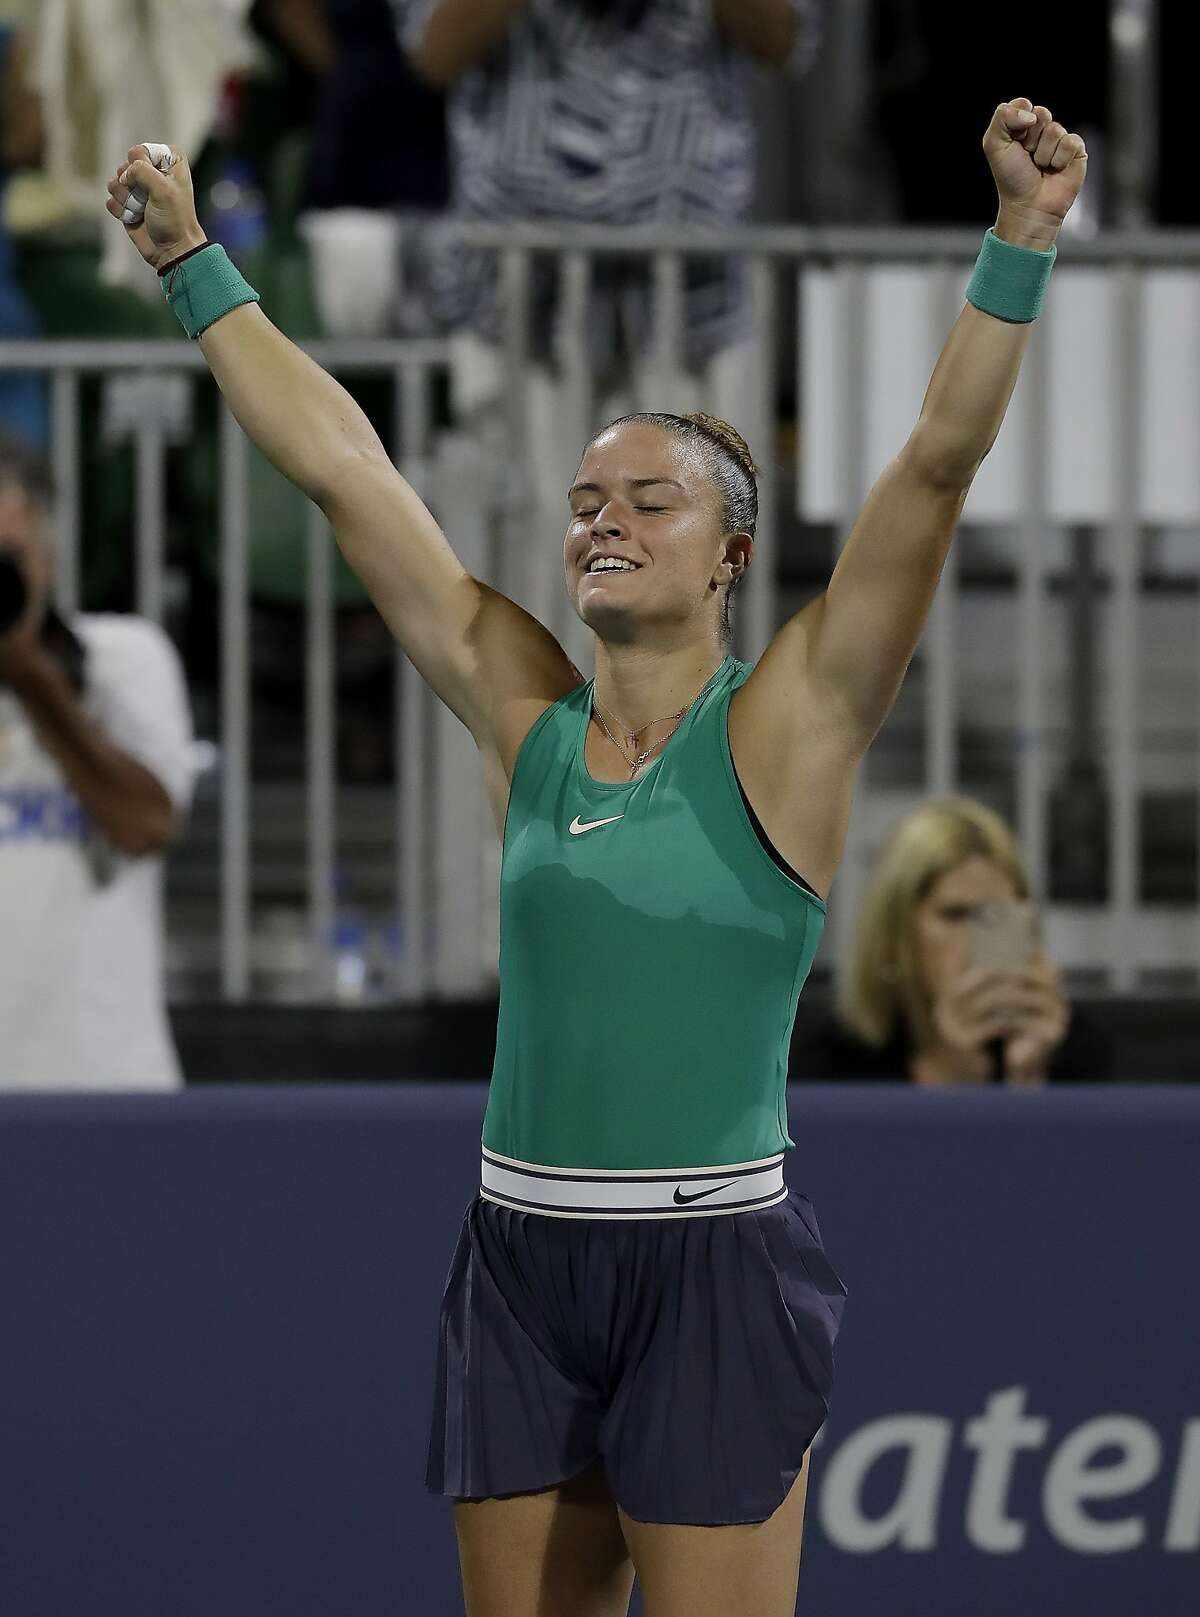 Maria Sakkari, of Greece, celebrates after beating Venus Williams, of the United States, during the Mubadala Silicon Valley Classic tennis tournament in San Jose, Calif., Friday, Aug. 3, 2018. Sakkari won 6-4, 7-6 (2). (AP Photo/Jeff Chiu)